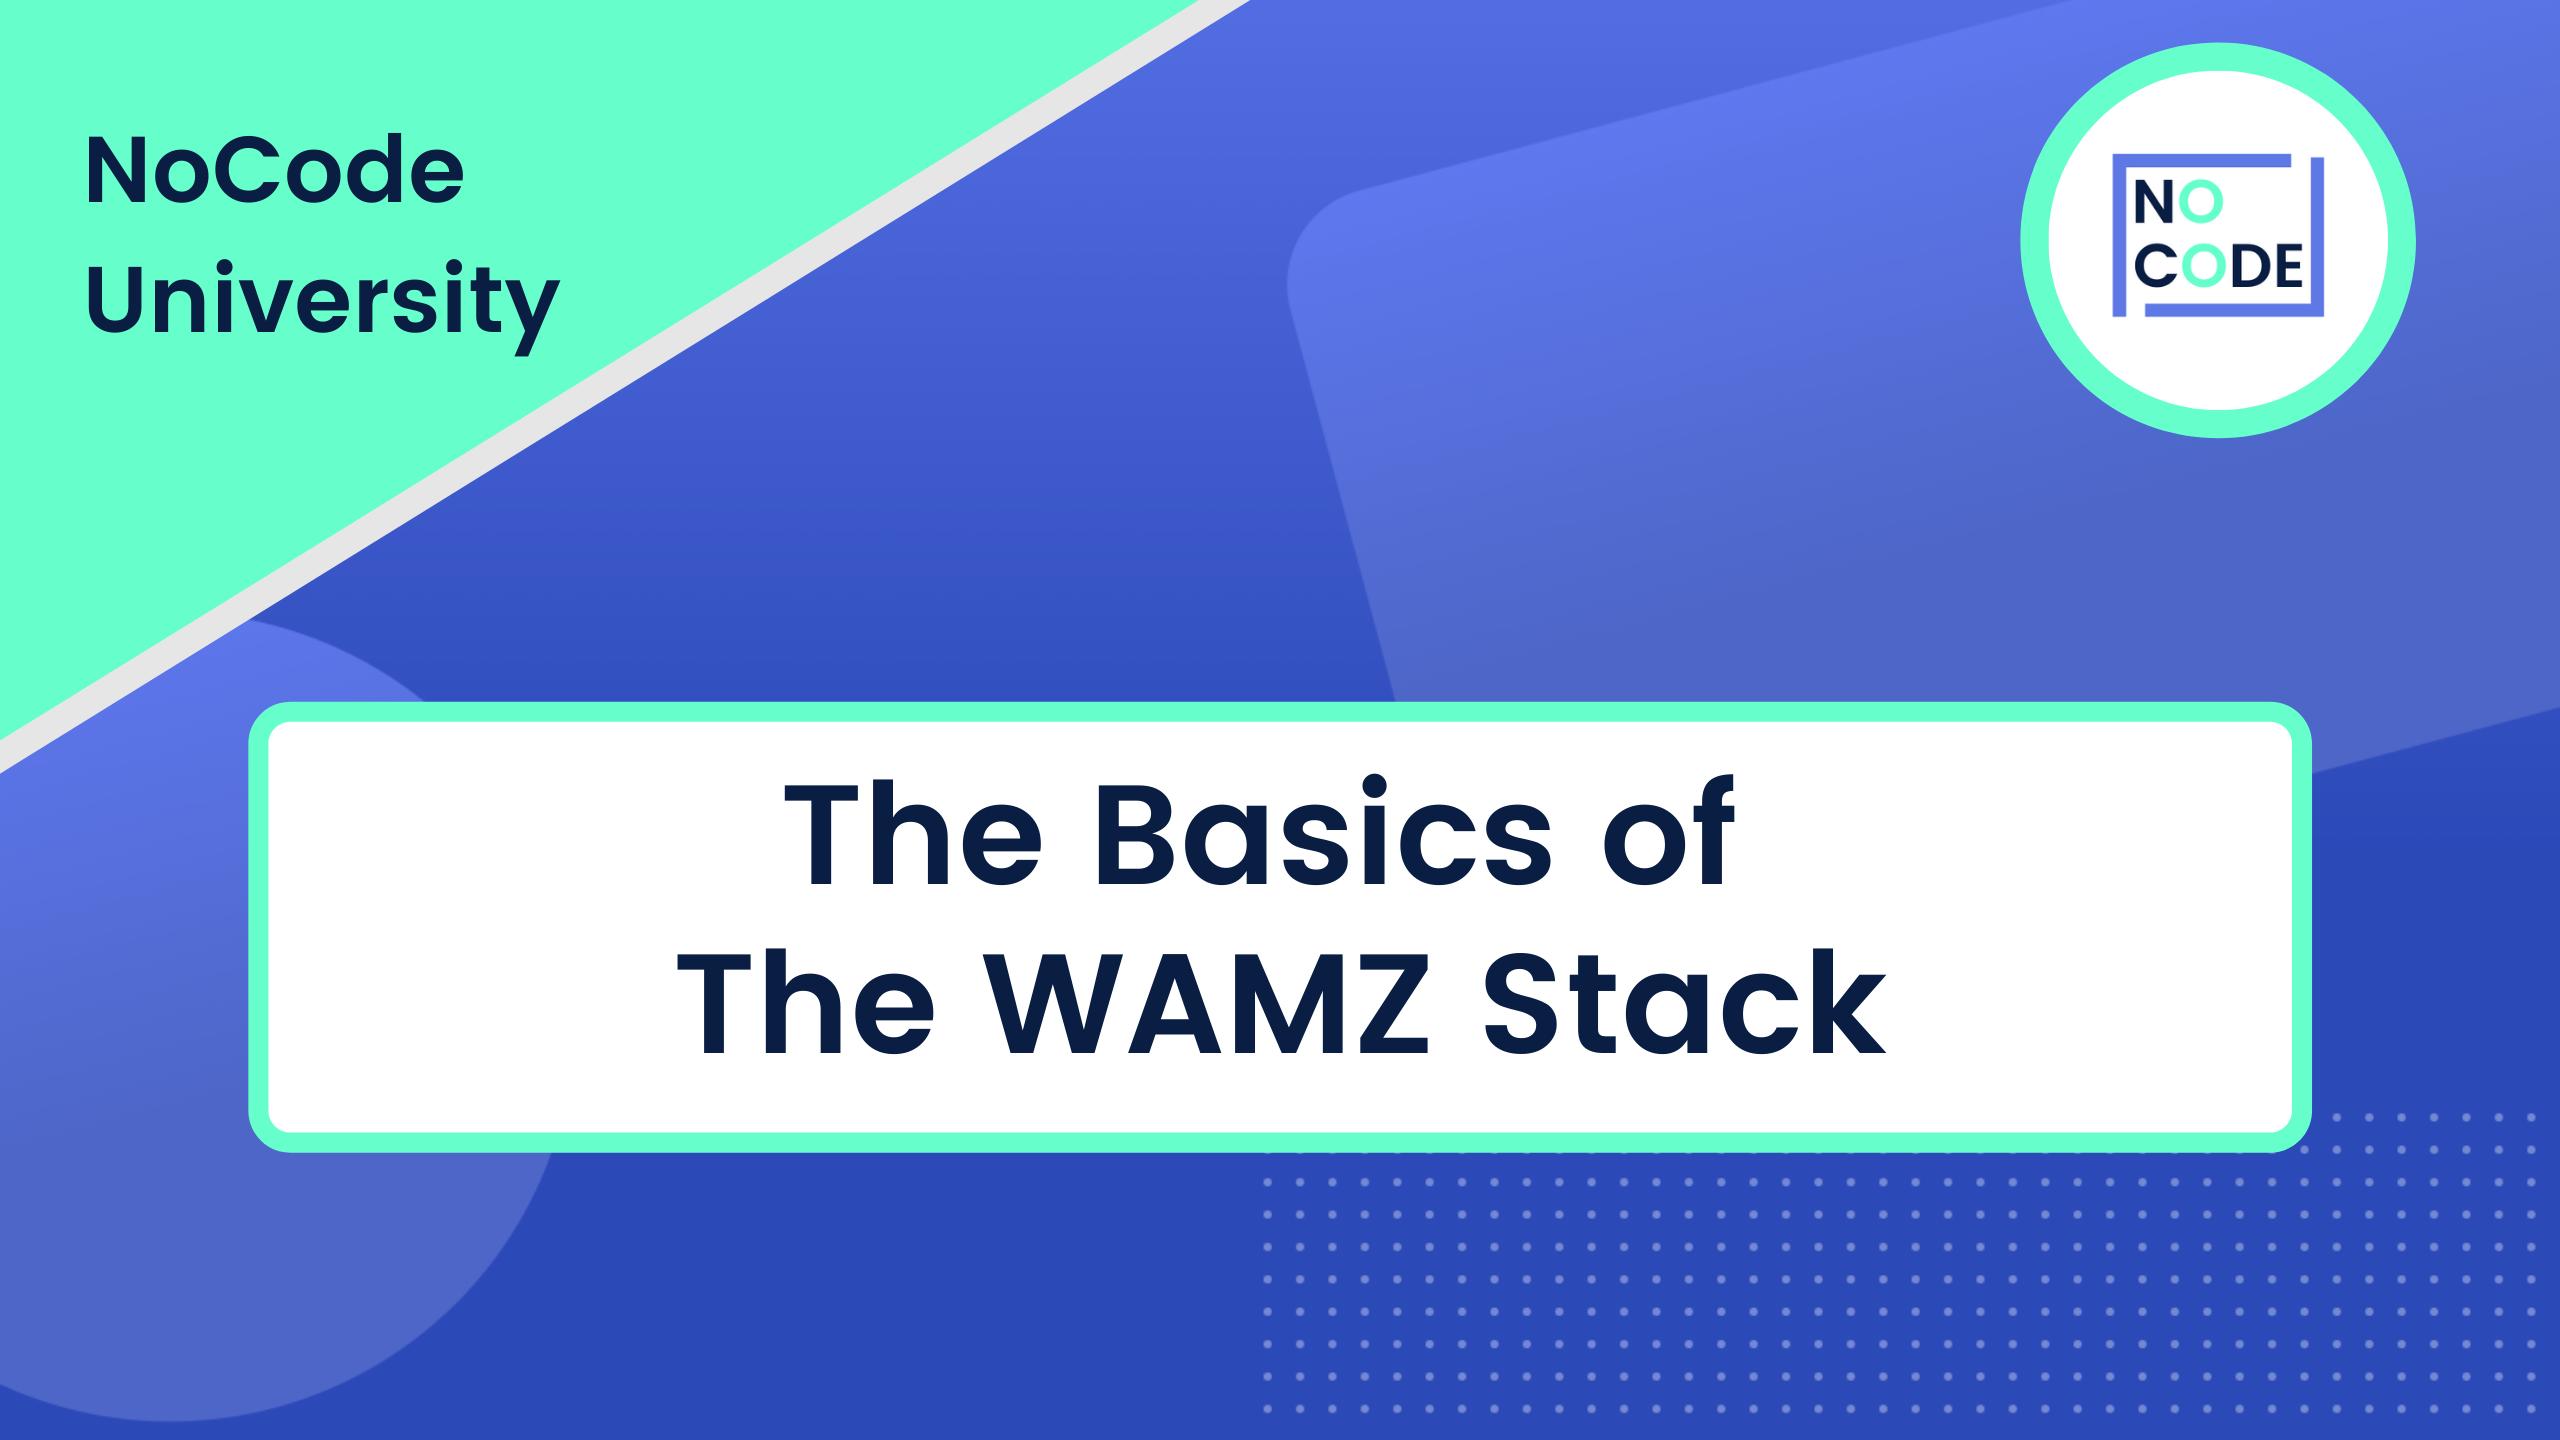 The Basics of the WAMZ Stack